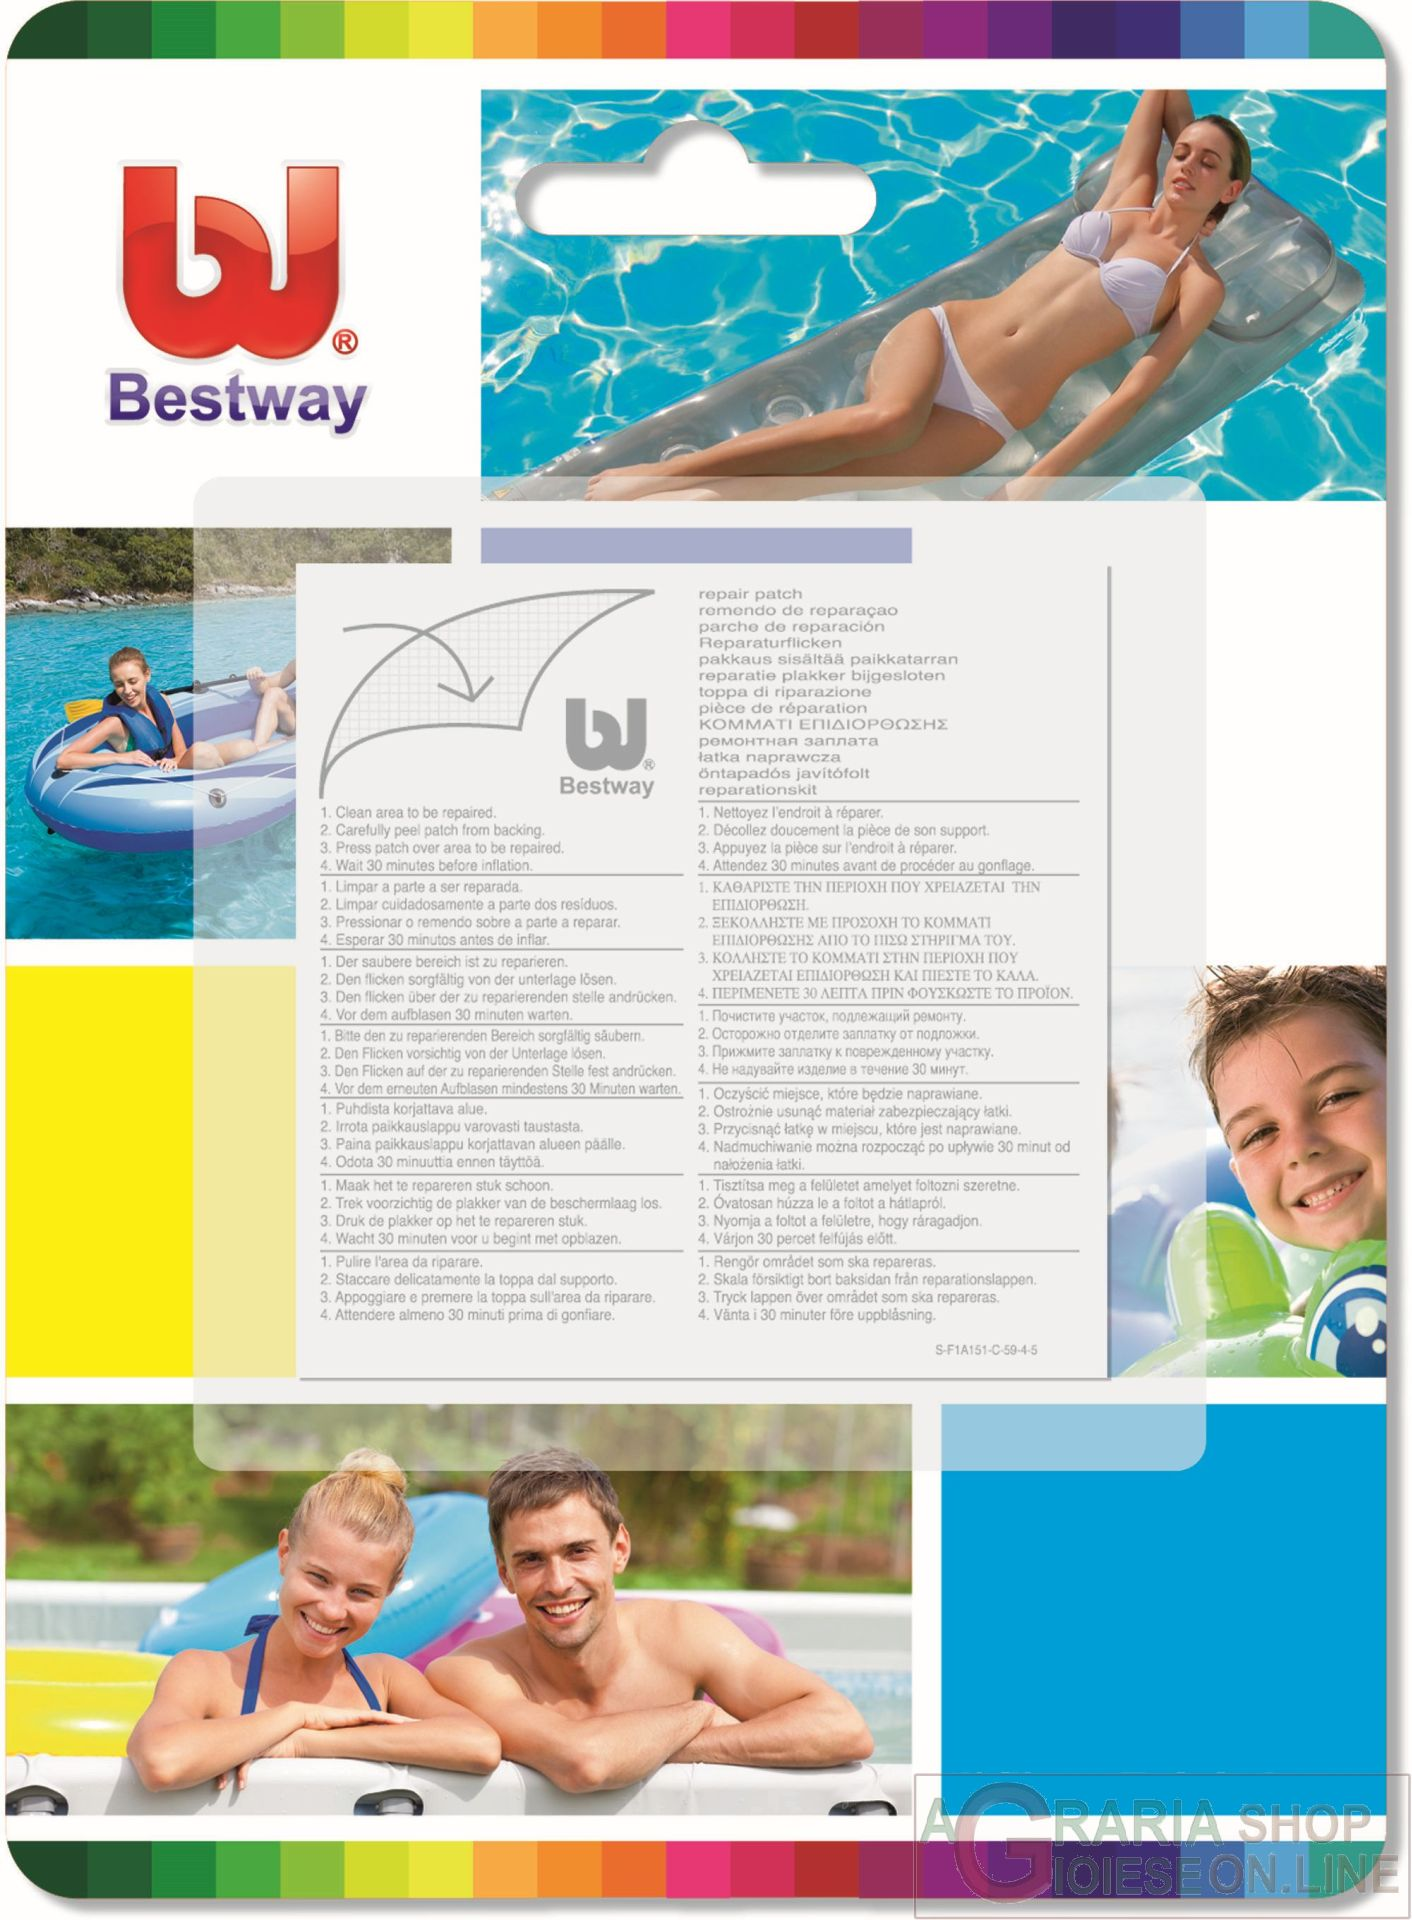 Bestway toppe di riparazione strong 10 pz incl 62068 - Riparazione telo piscina ...